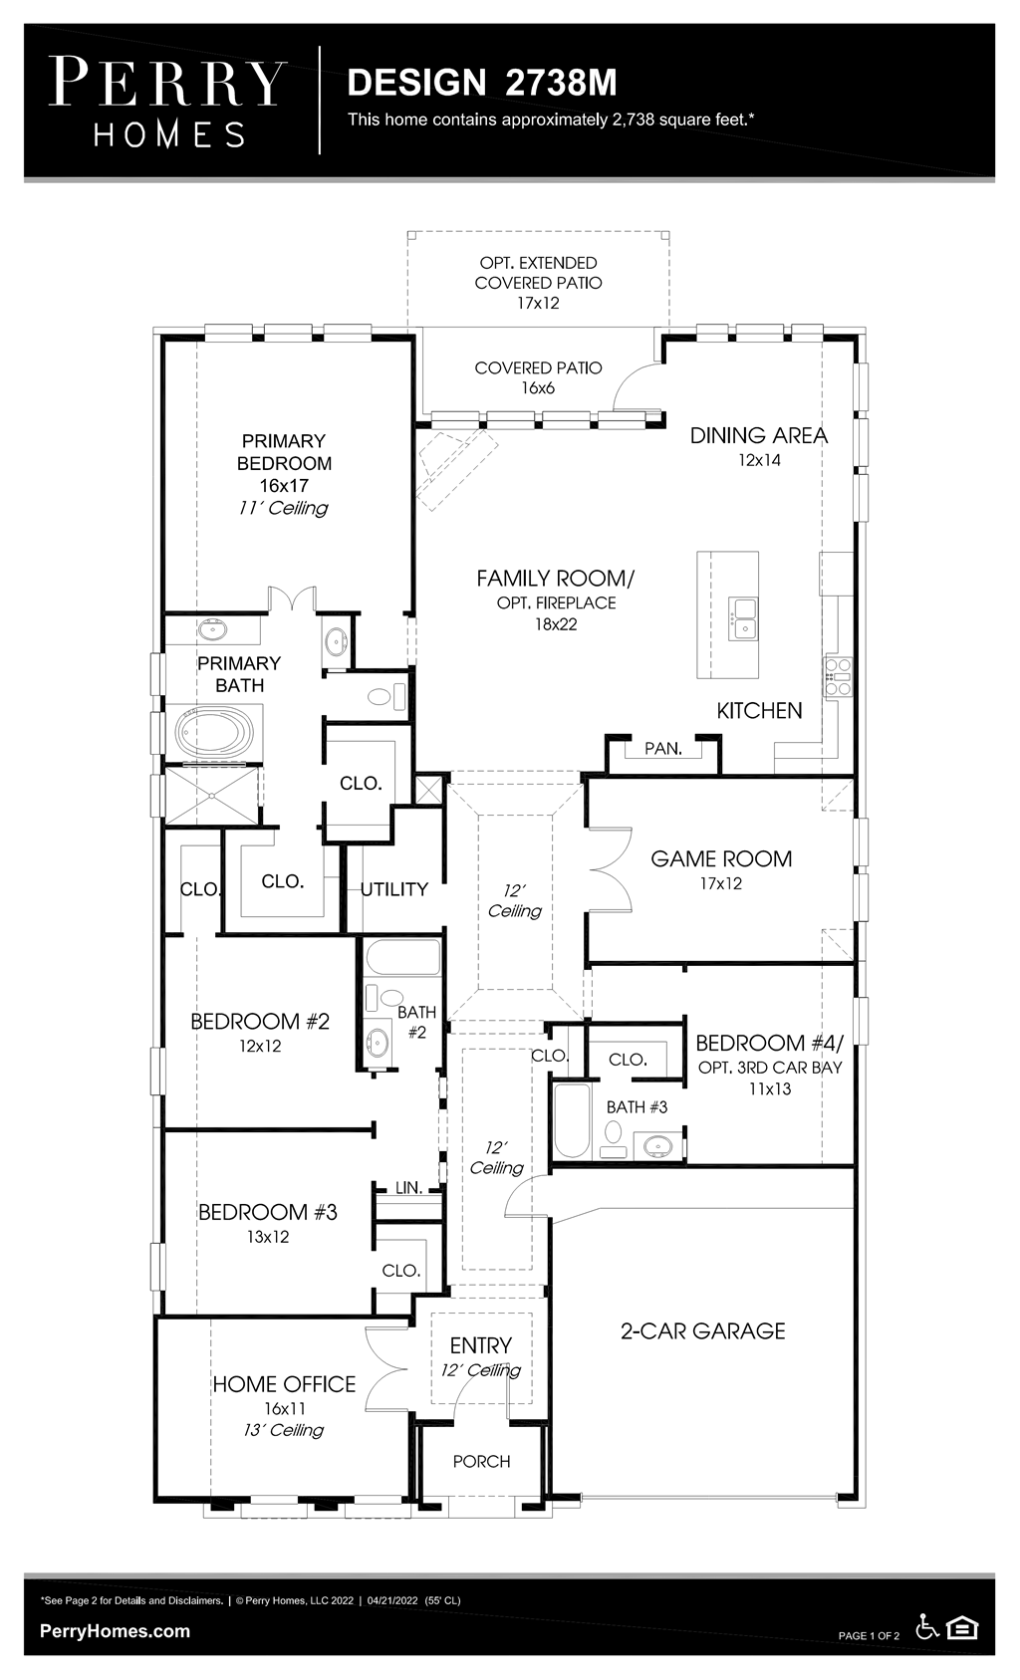 Floor Plan for 2738M